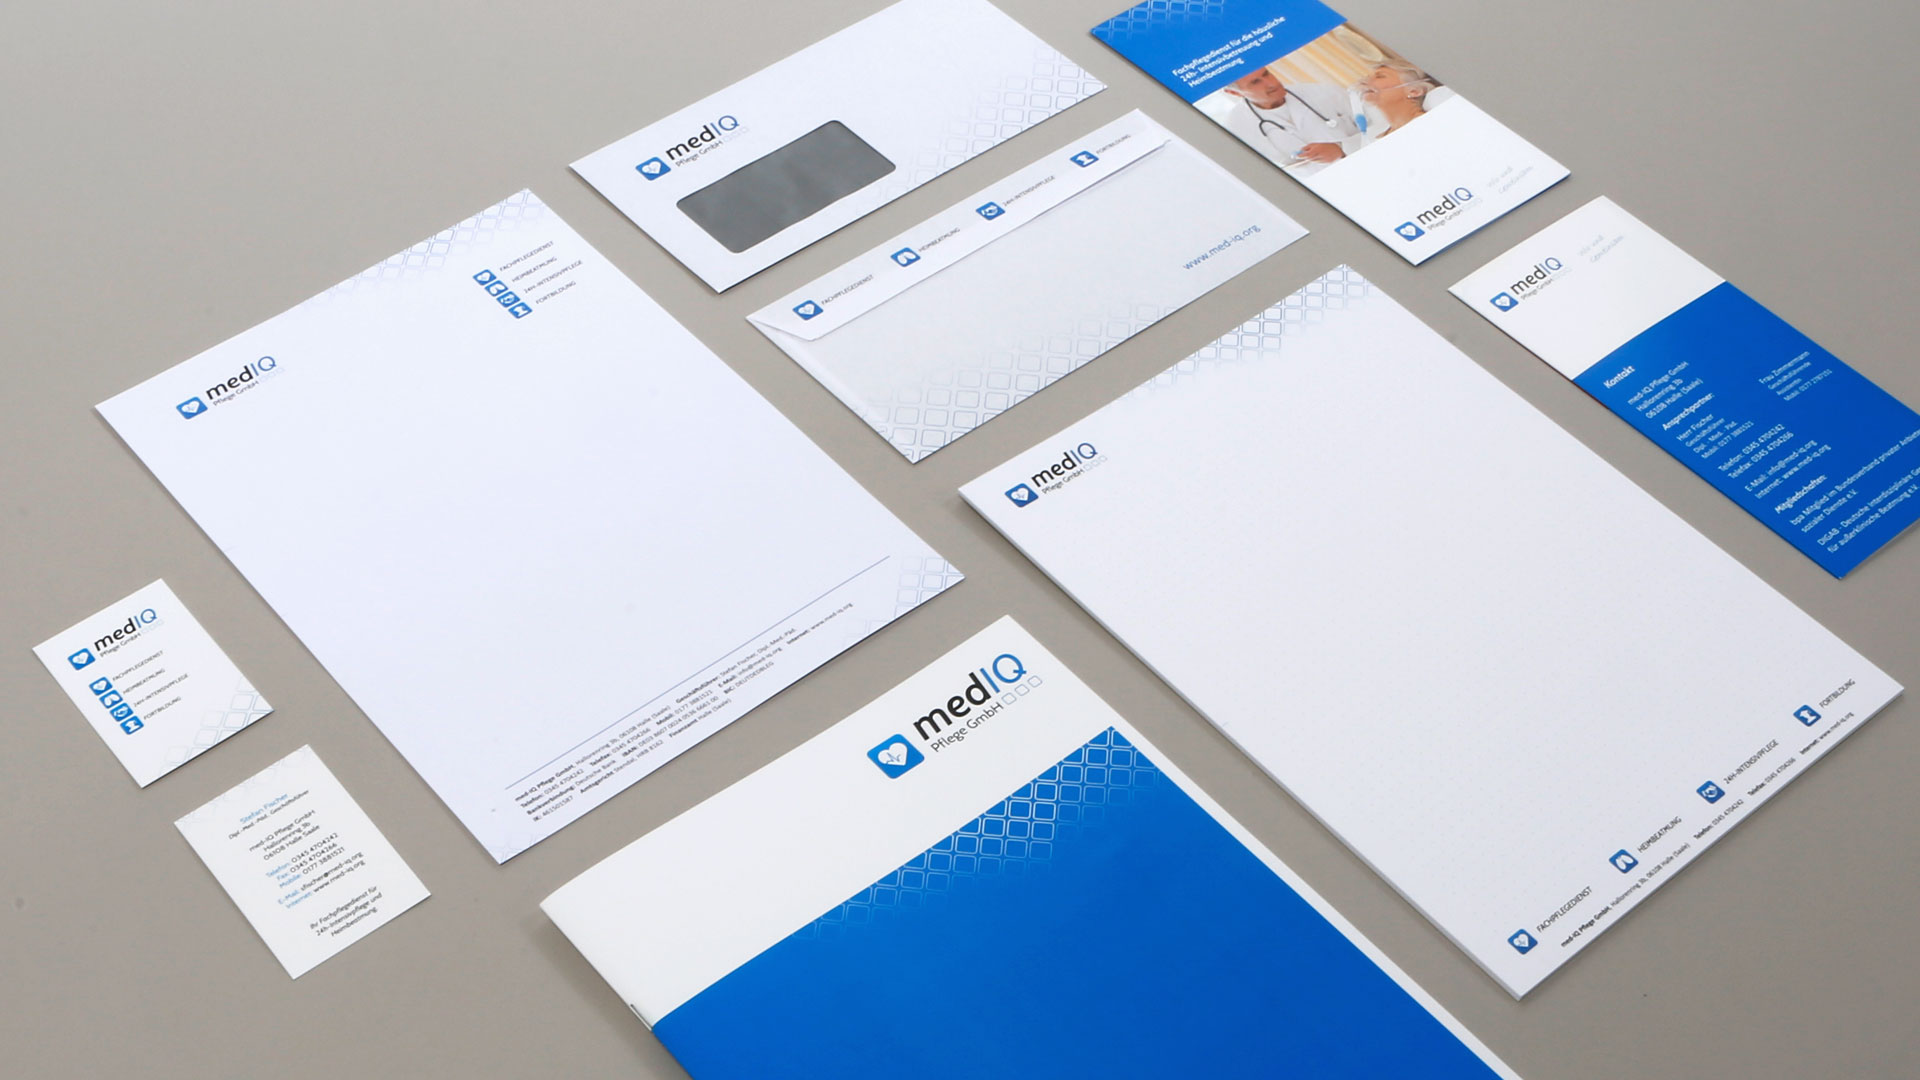 med-IQ Pflege GmbH